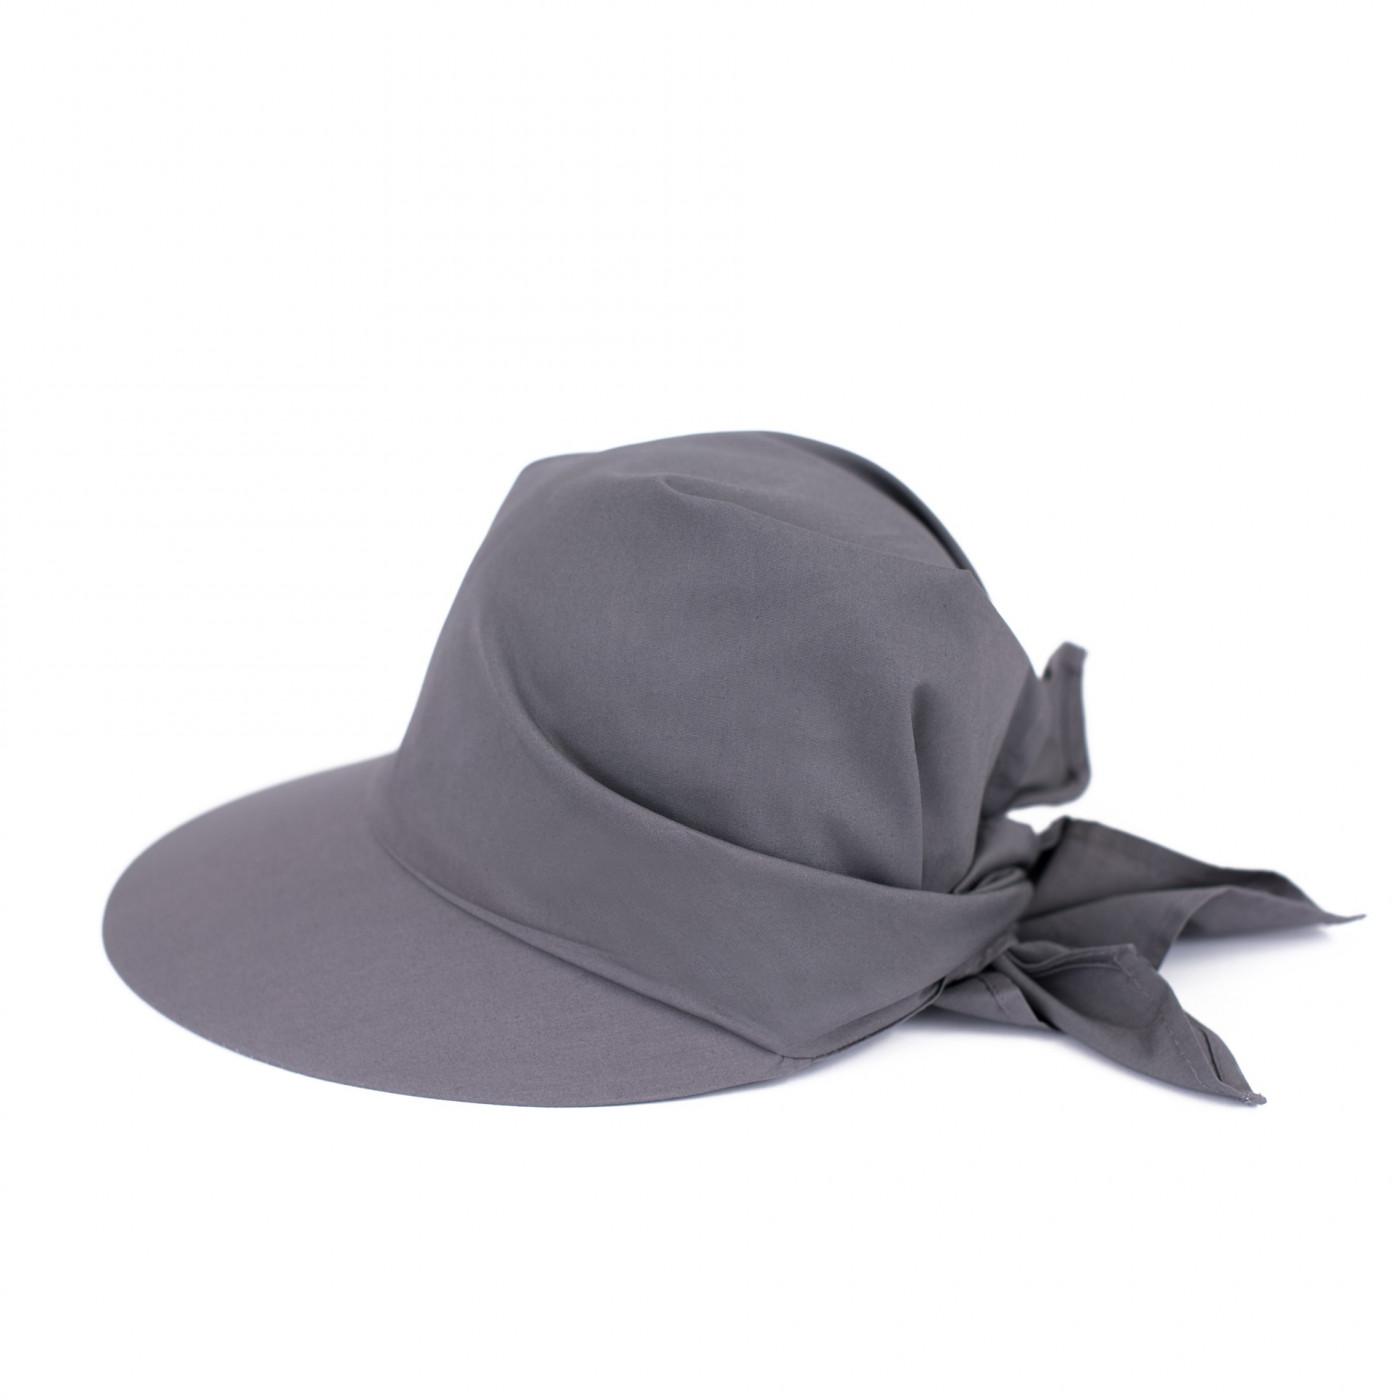 Art Of Polo Woman's Visor Hat cz19429